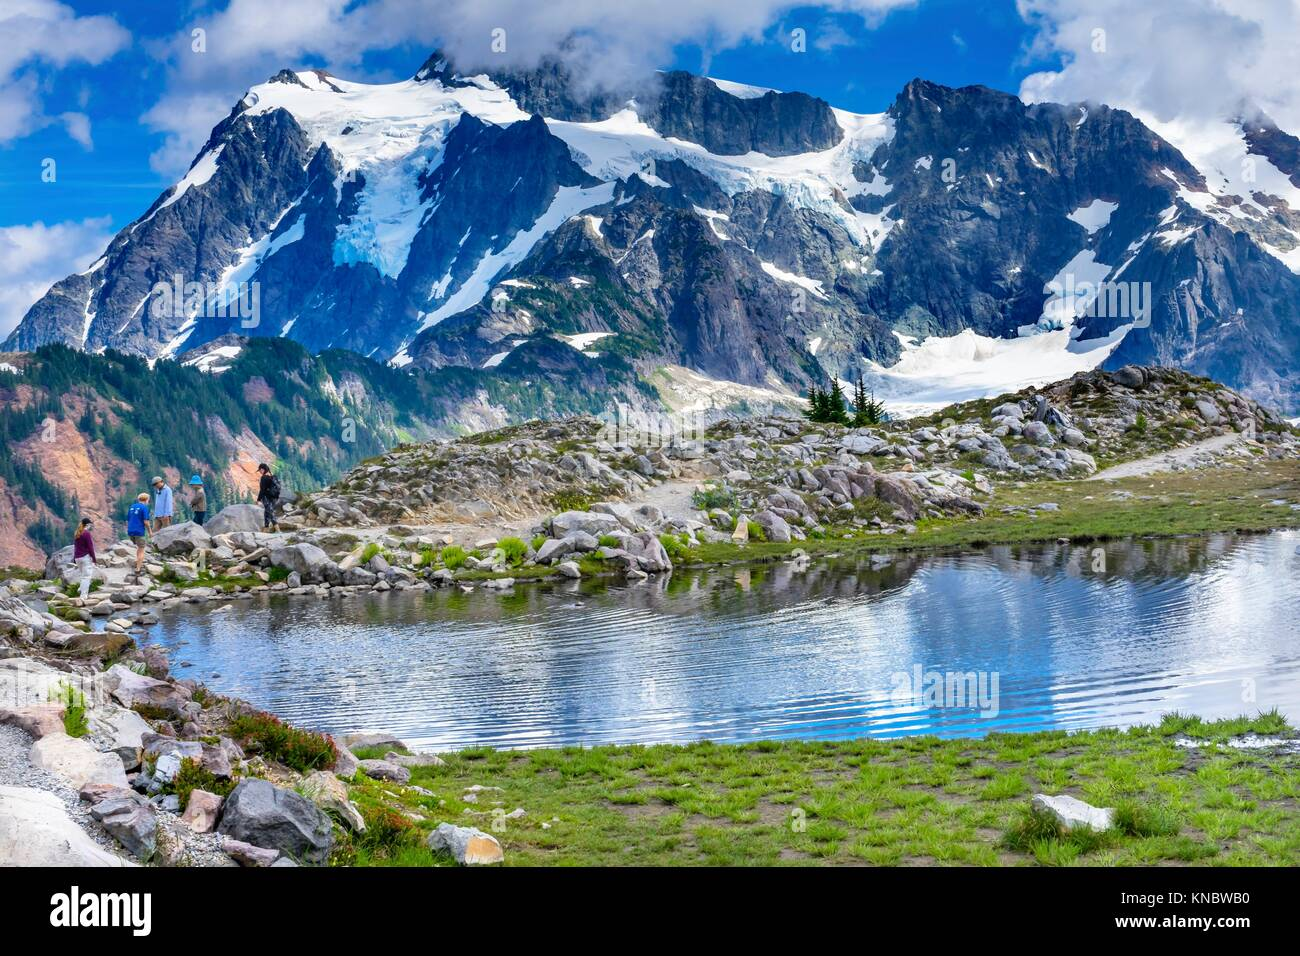 Hikers Mount Shuksan Pool Reflection Summer Artist Point Mount Baker Highway. Pacific Northwest, Washington State, - Stock Image